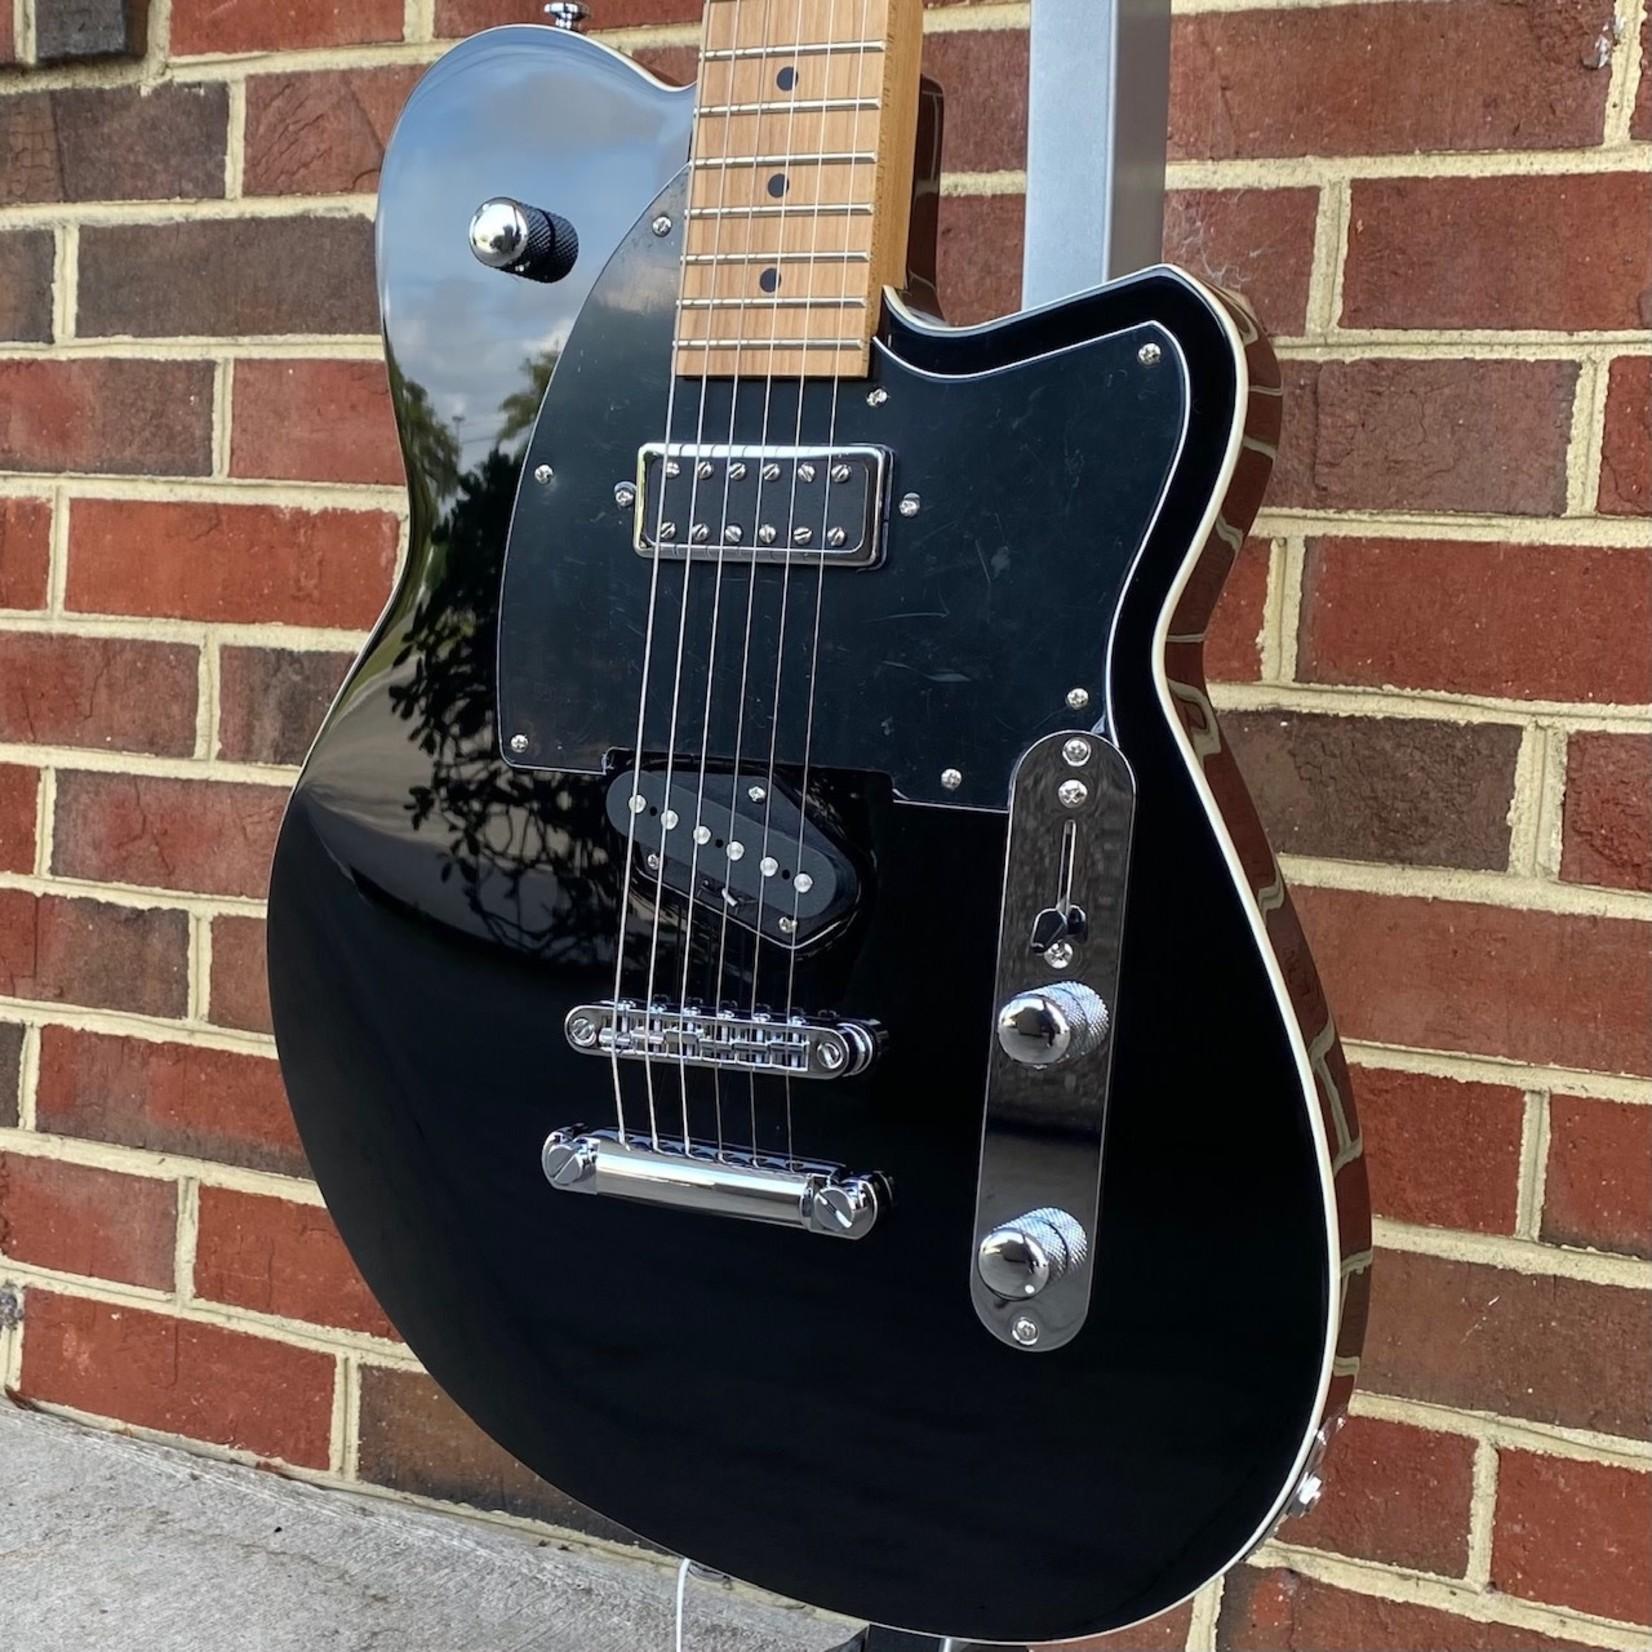 Reverend Reverend Guitars Buckshot, Midnight Black, Roasted Maple Neck, Korina Body, Locking Tuners